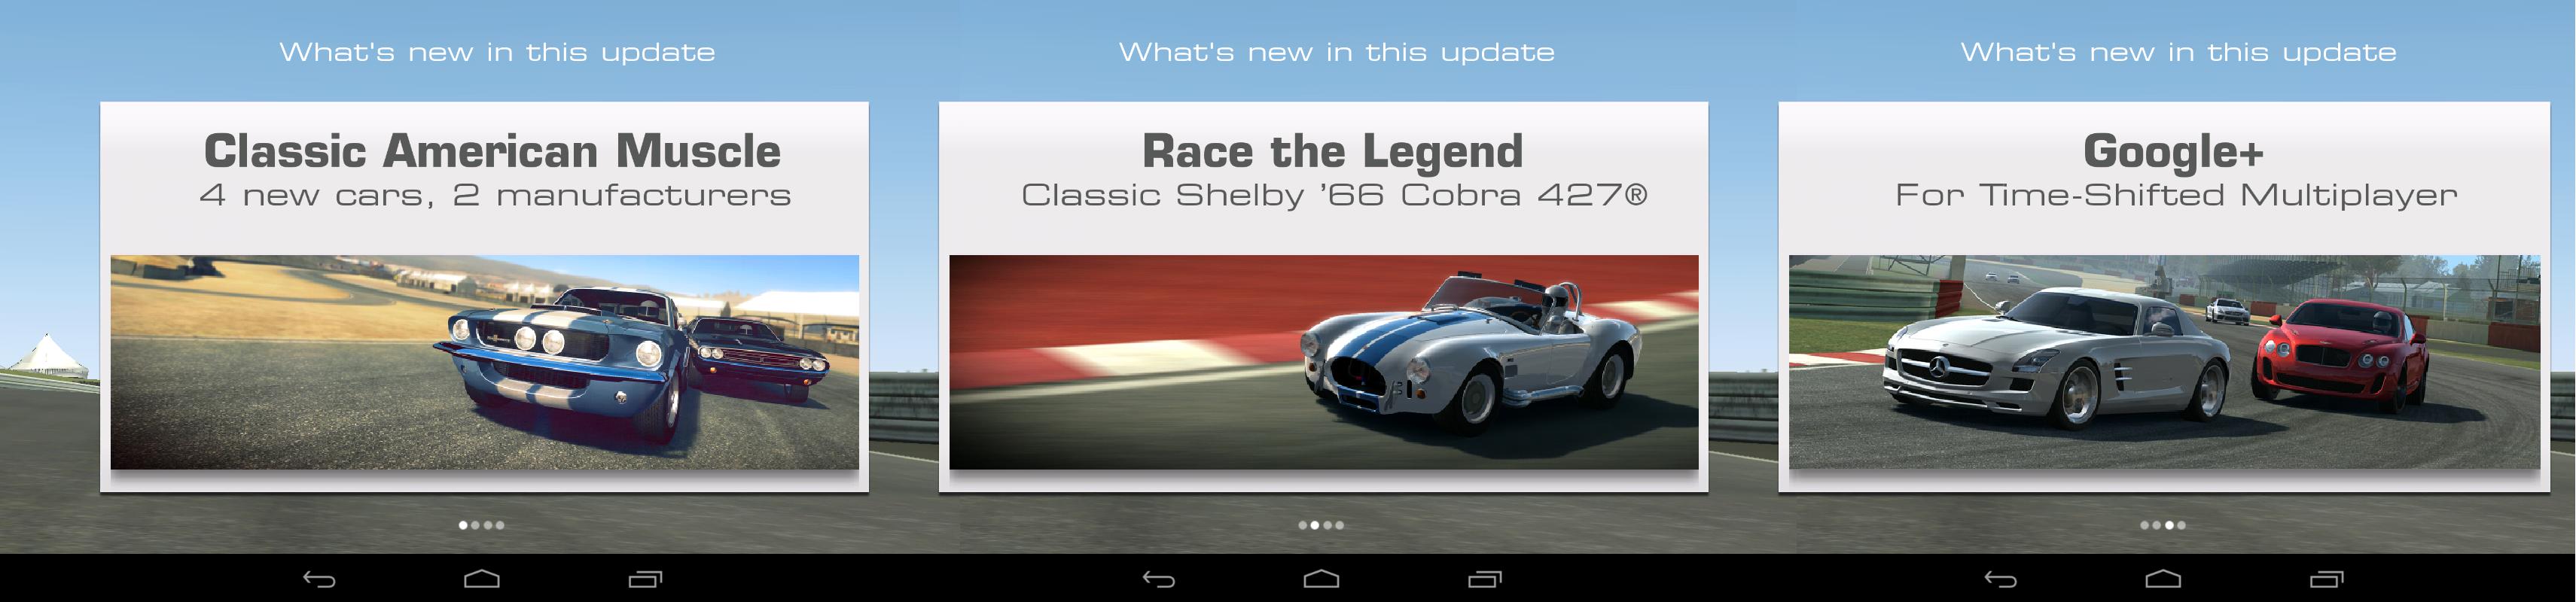 newstuff-wide Fascinating Bugatti Veyron Price In Real Racing 3 Cars Trend